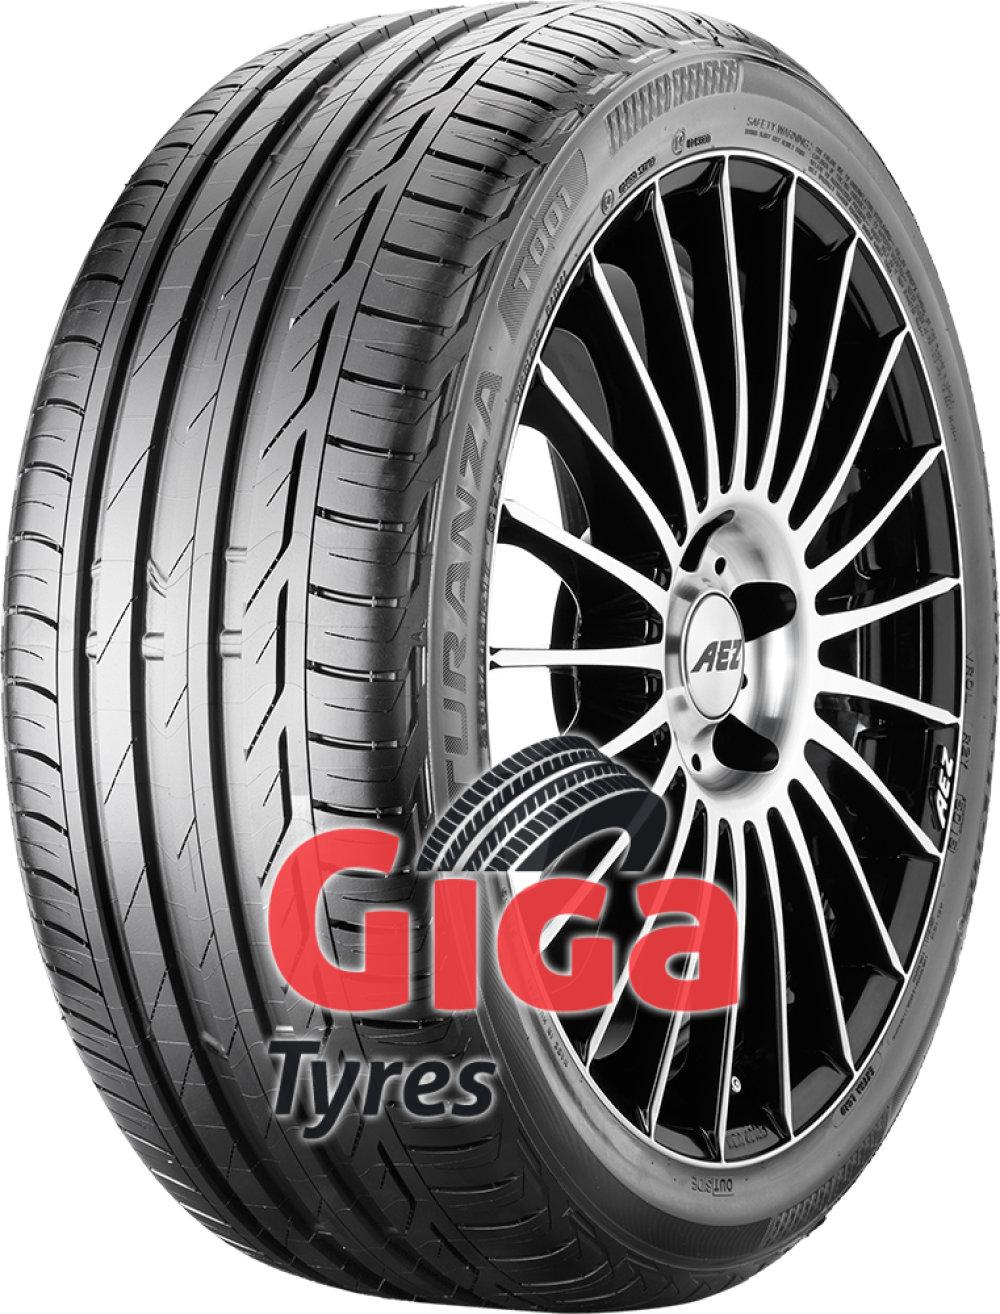 Bridgestone Turanza T001 Evo ( 205/55 R17 95V XL )